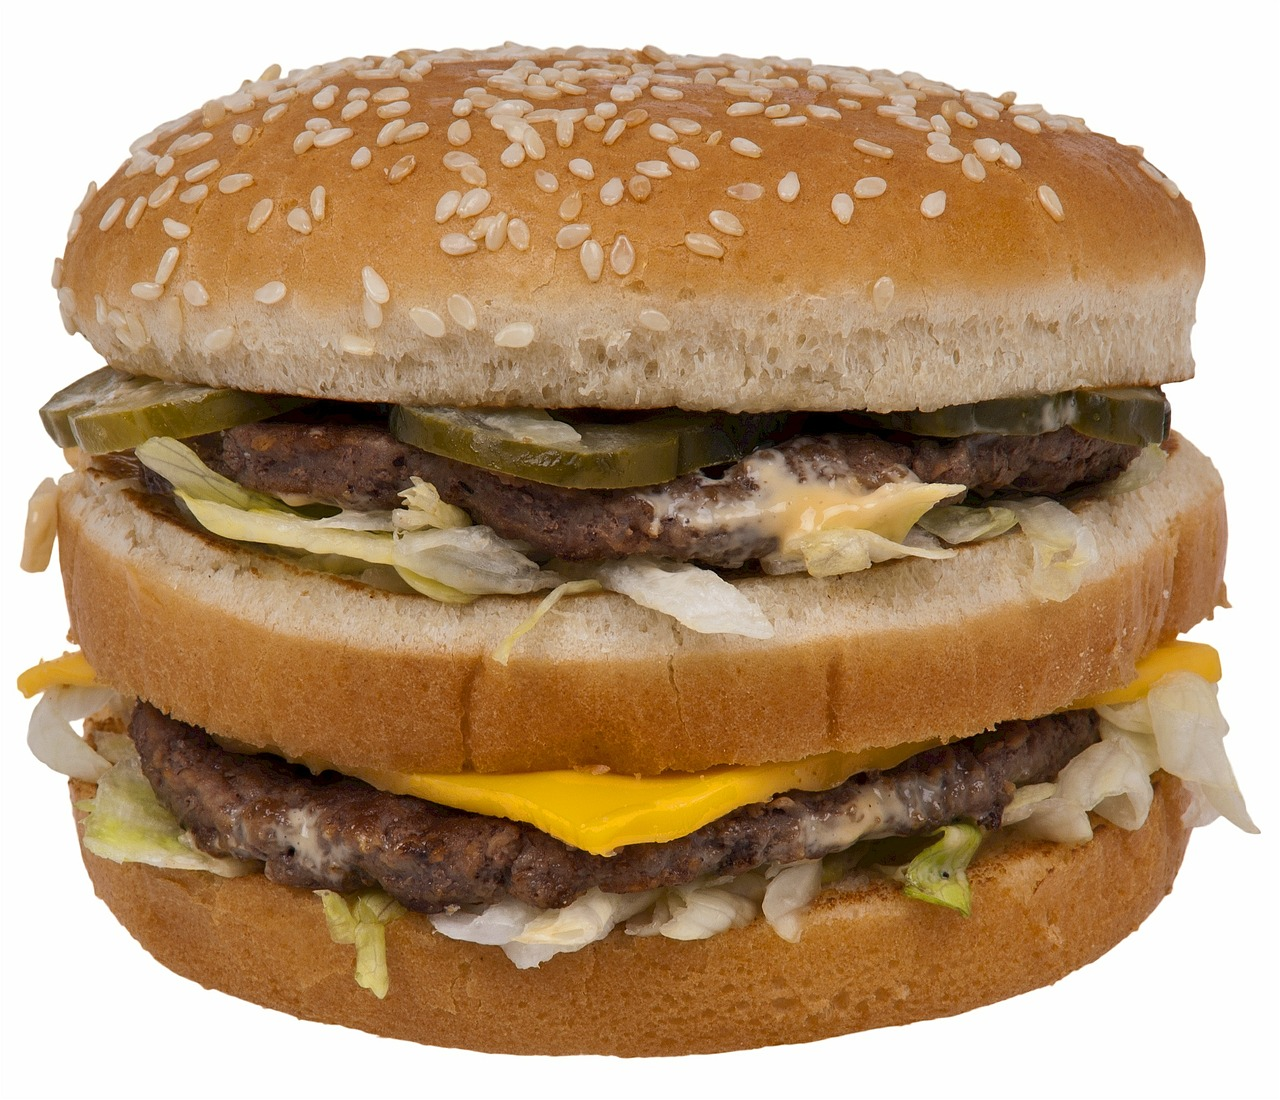 hoax sperma auf mcdonalds burger anti spam info. Black Bedroom Furniture Sets. Home Design Ideas